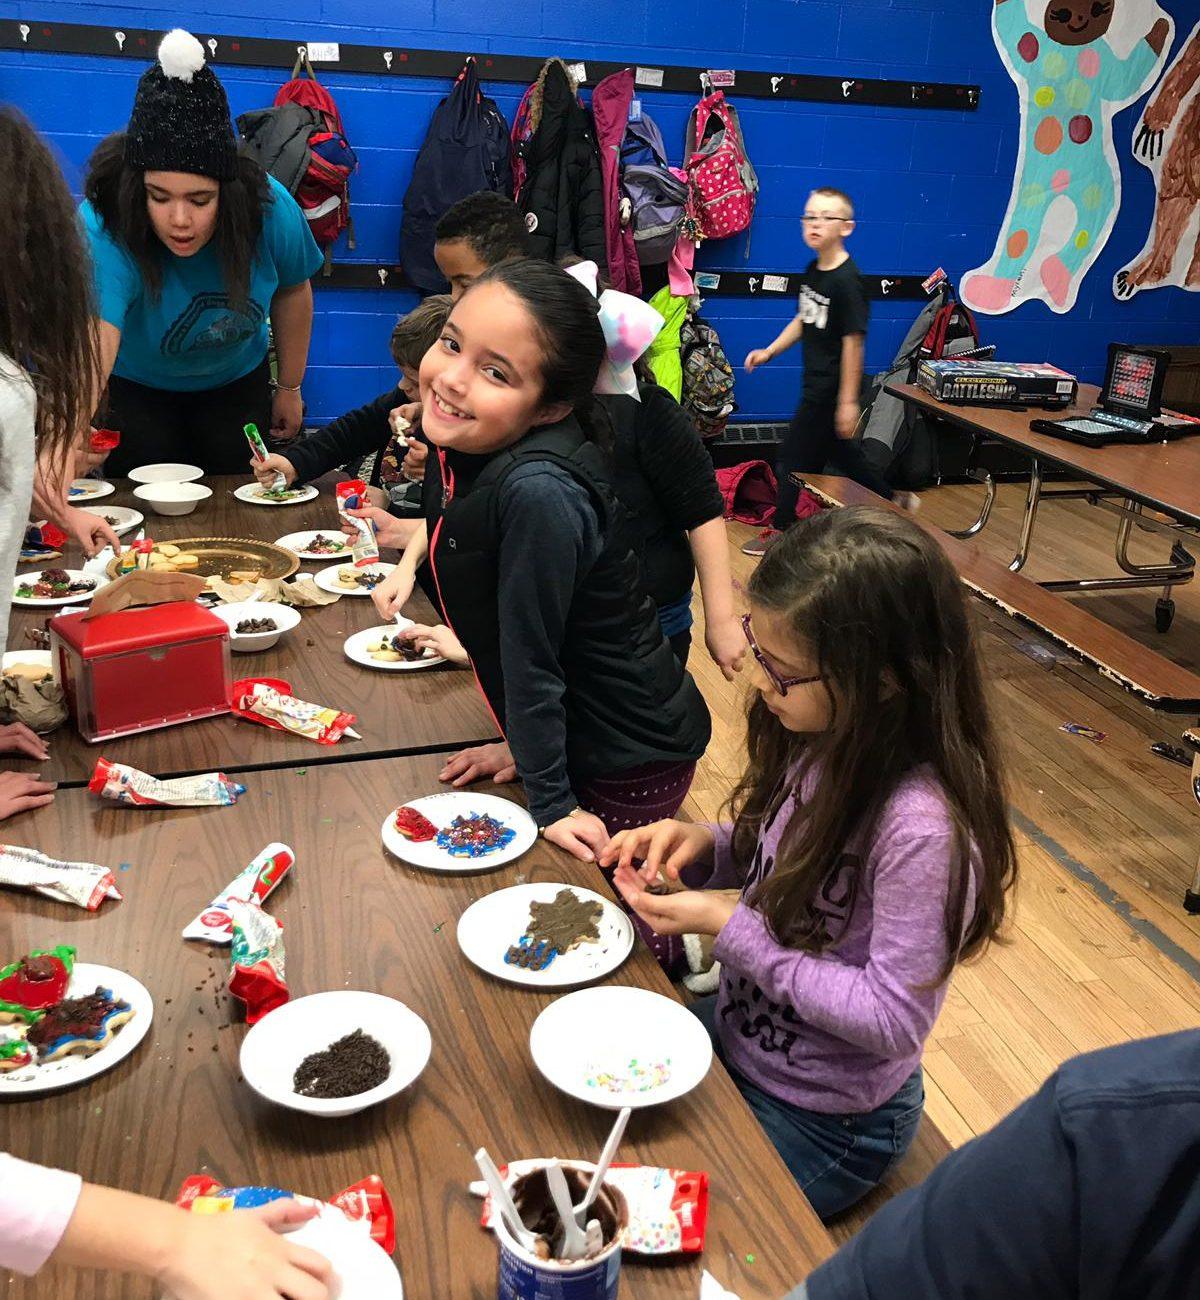 Marthas's Vineyard Teddy Bear Suite Fundraiser Supports Healthy Happy Kids H2K Childhood Hunger Program